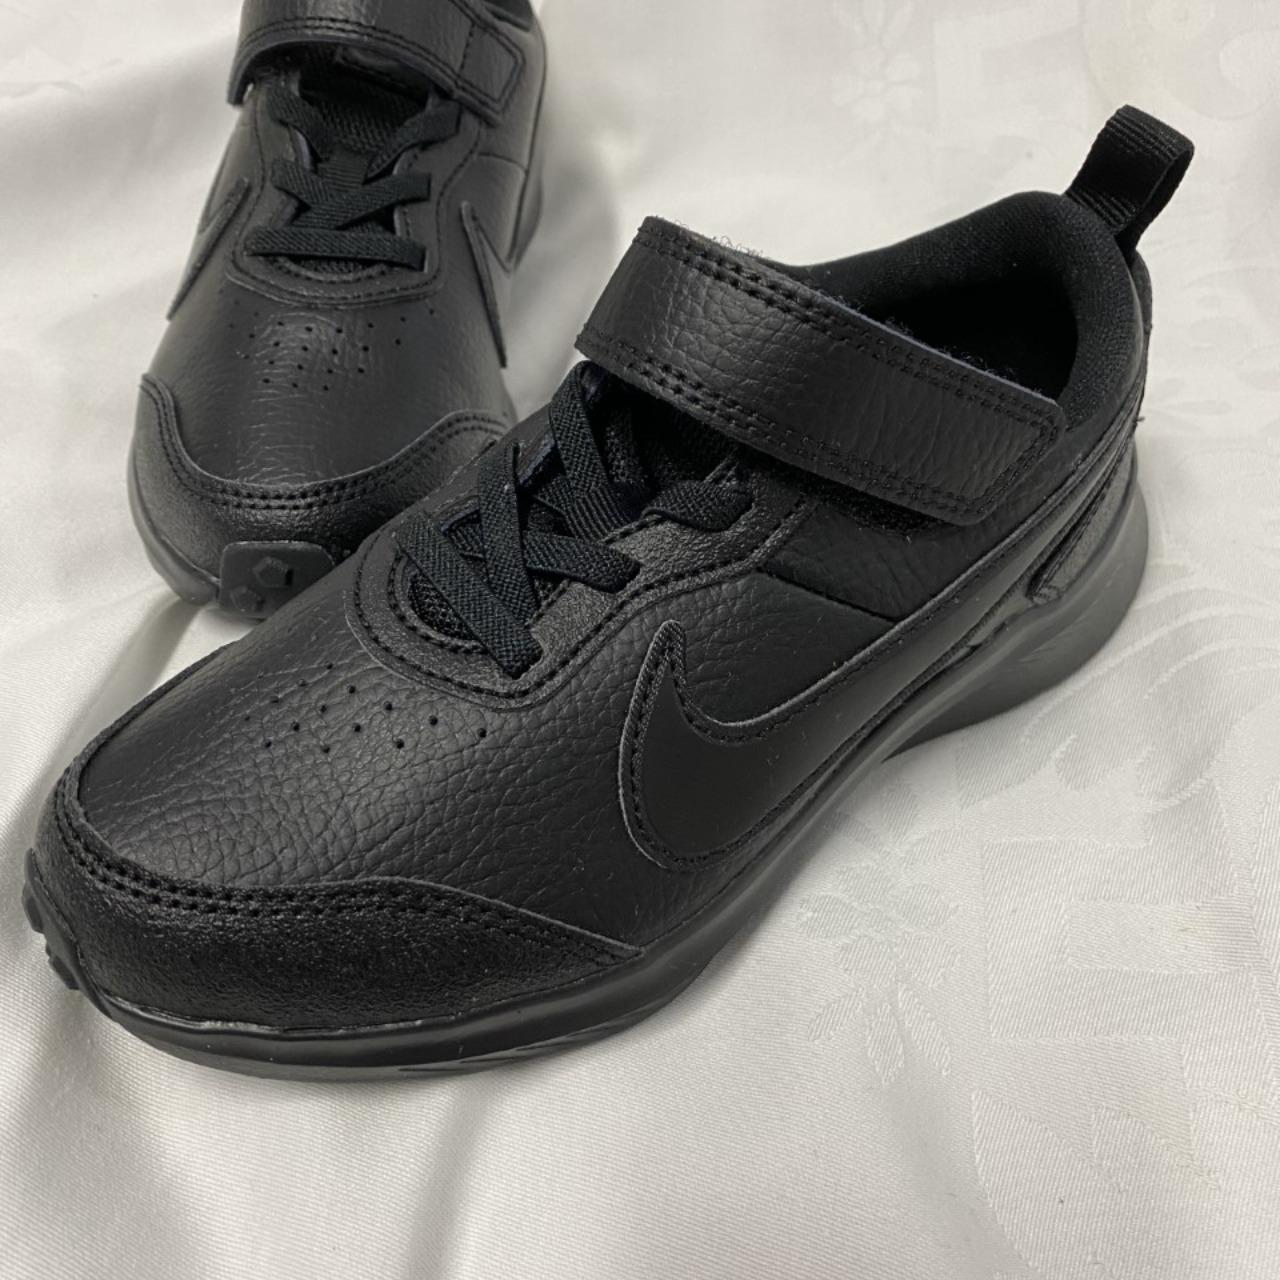 Nike Kids Black size 12